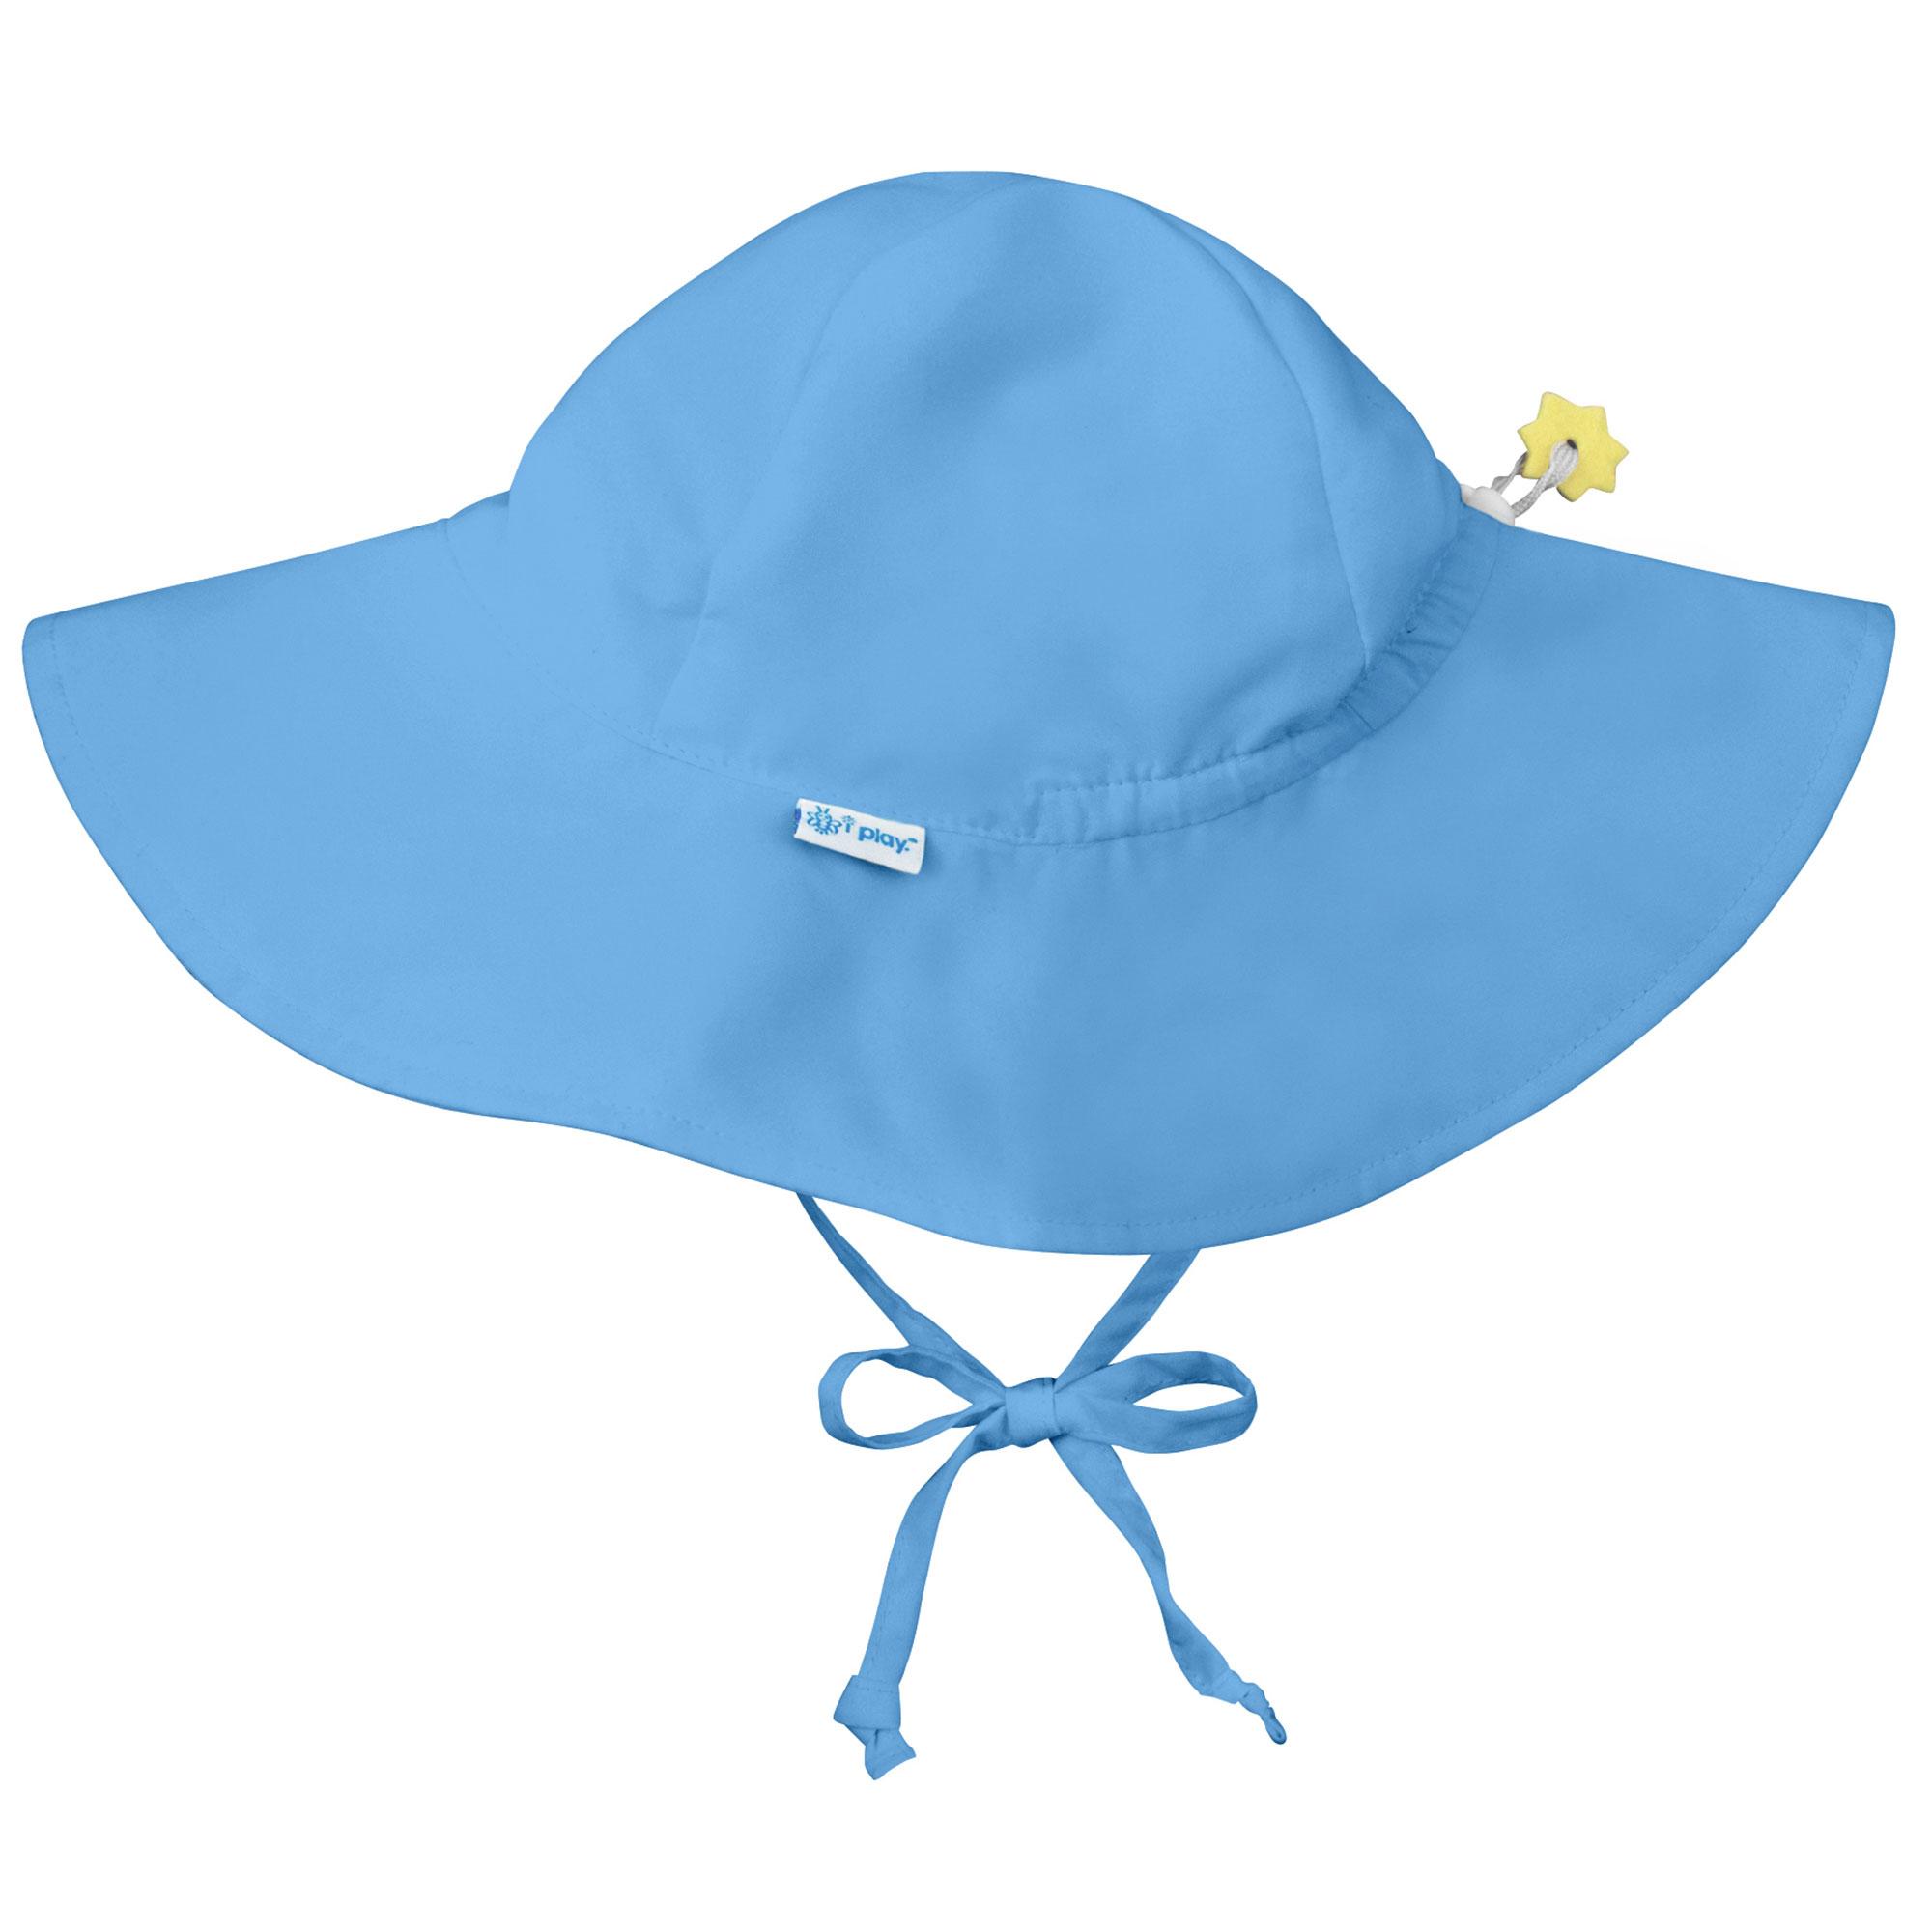 Kids Boys Blue Dinosaur Bucket Sun Hat with Chin Strap Age 1 2 3 4 5 6 7 8